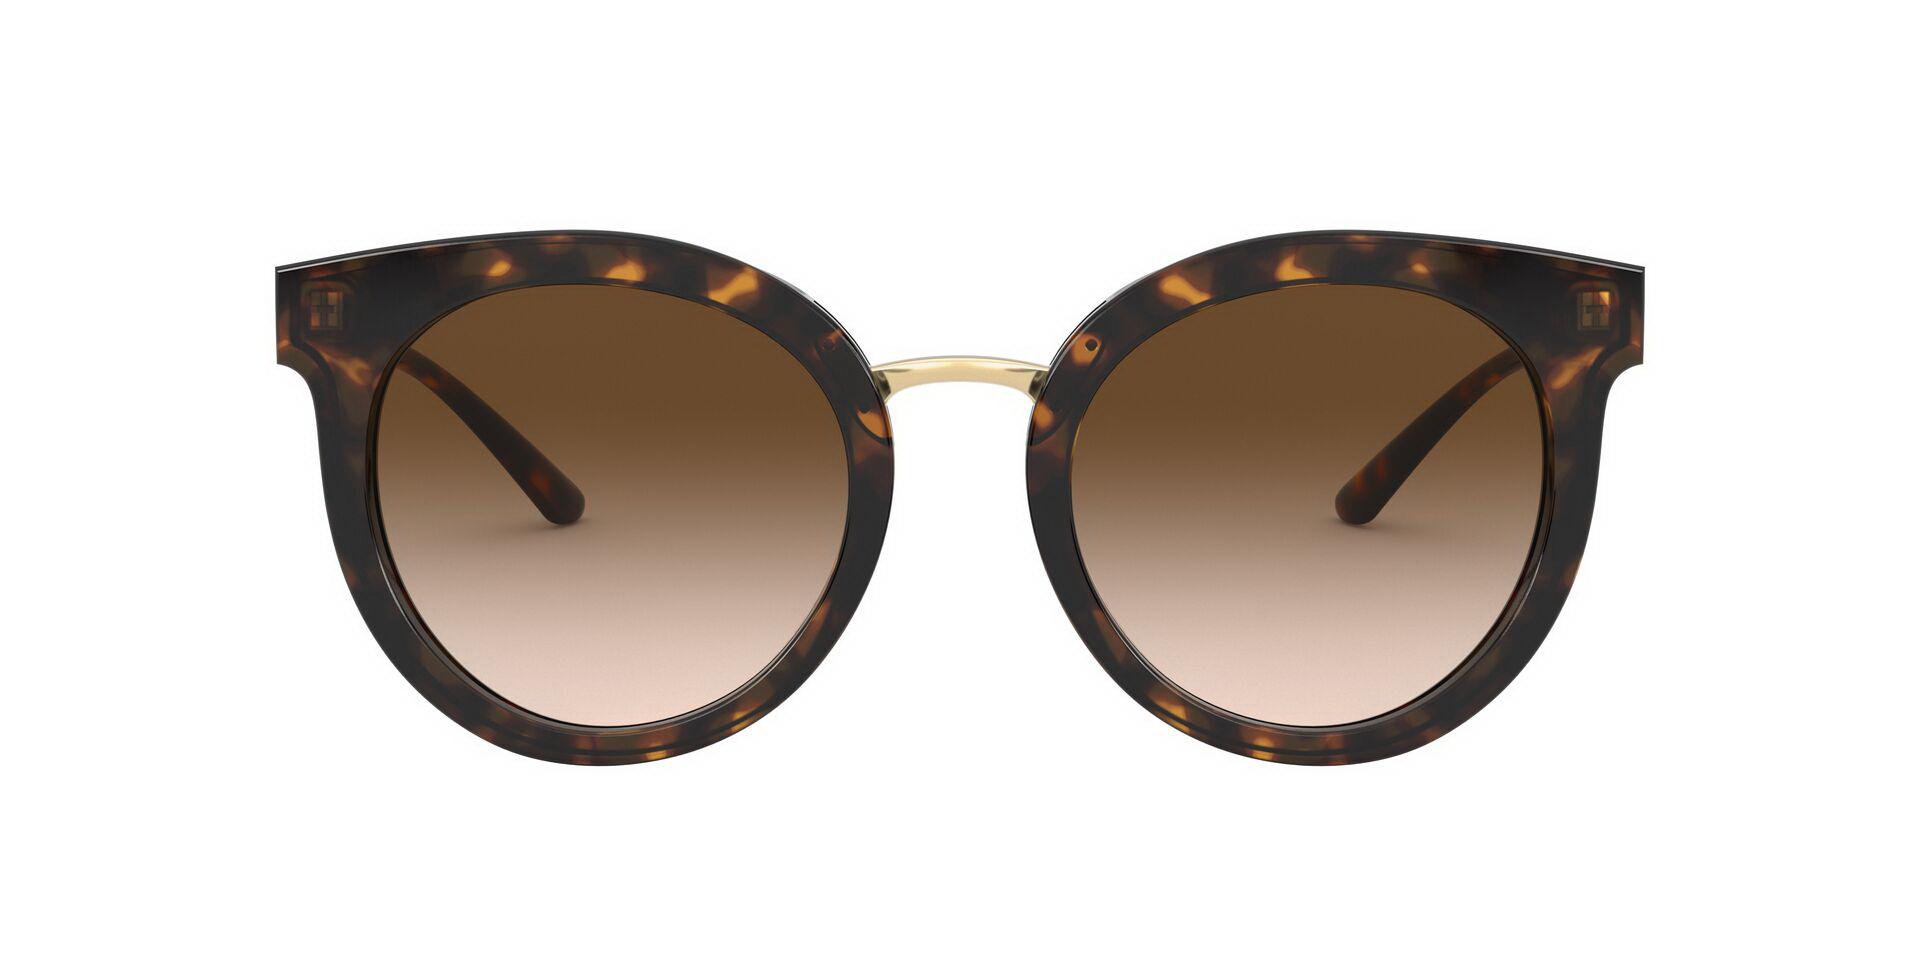 Солнцезащитные очки Очки с/з DOLCE&GABBANA 0DG4371 502/13 фото